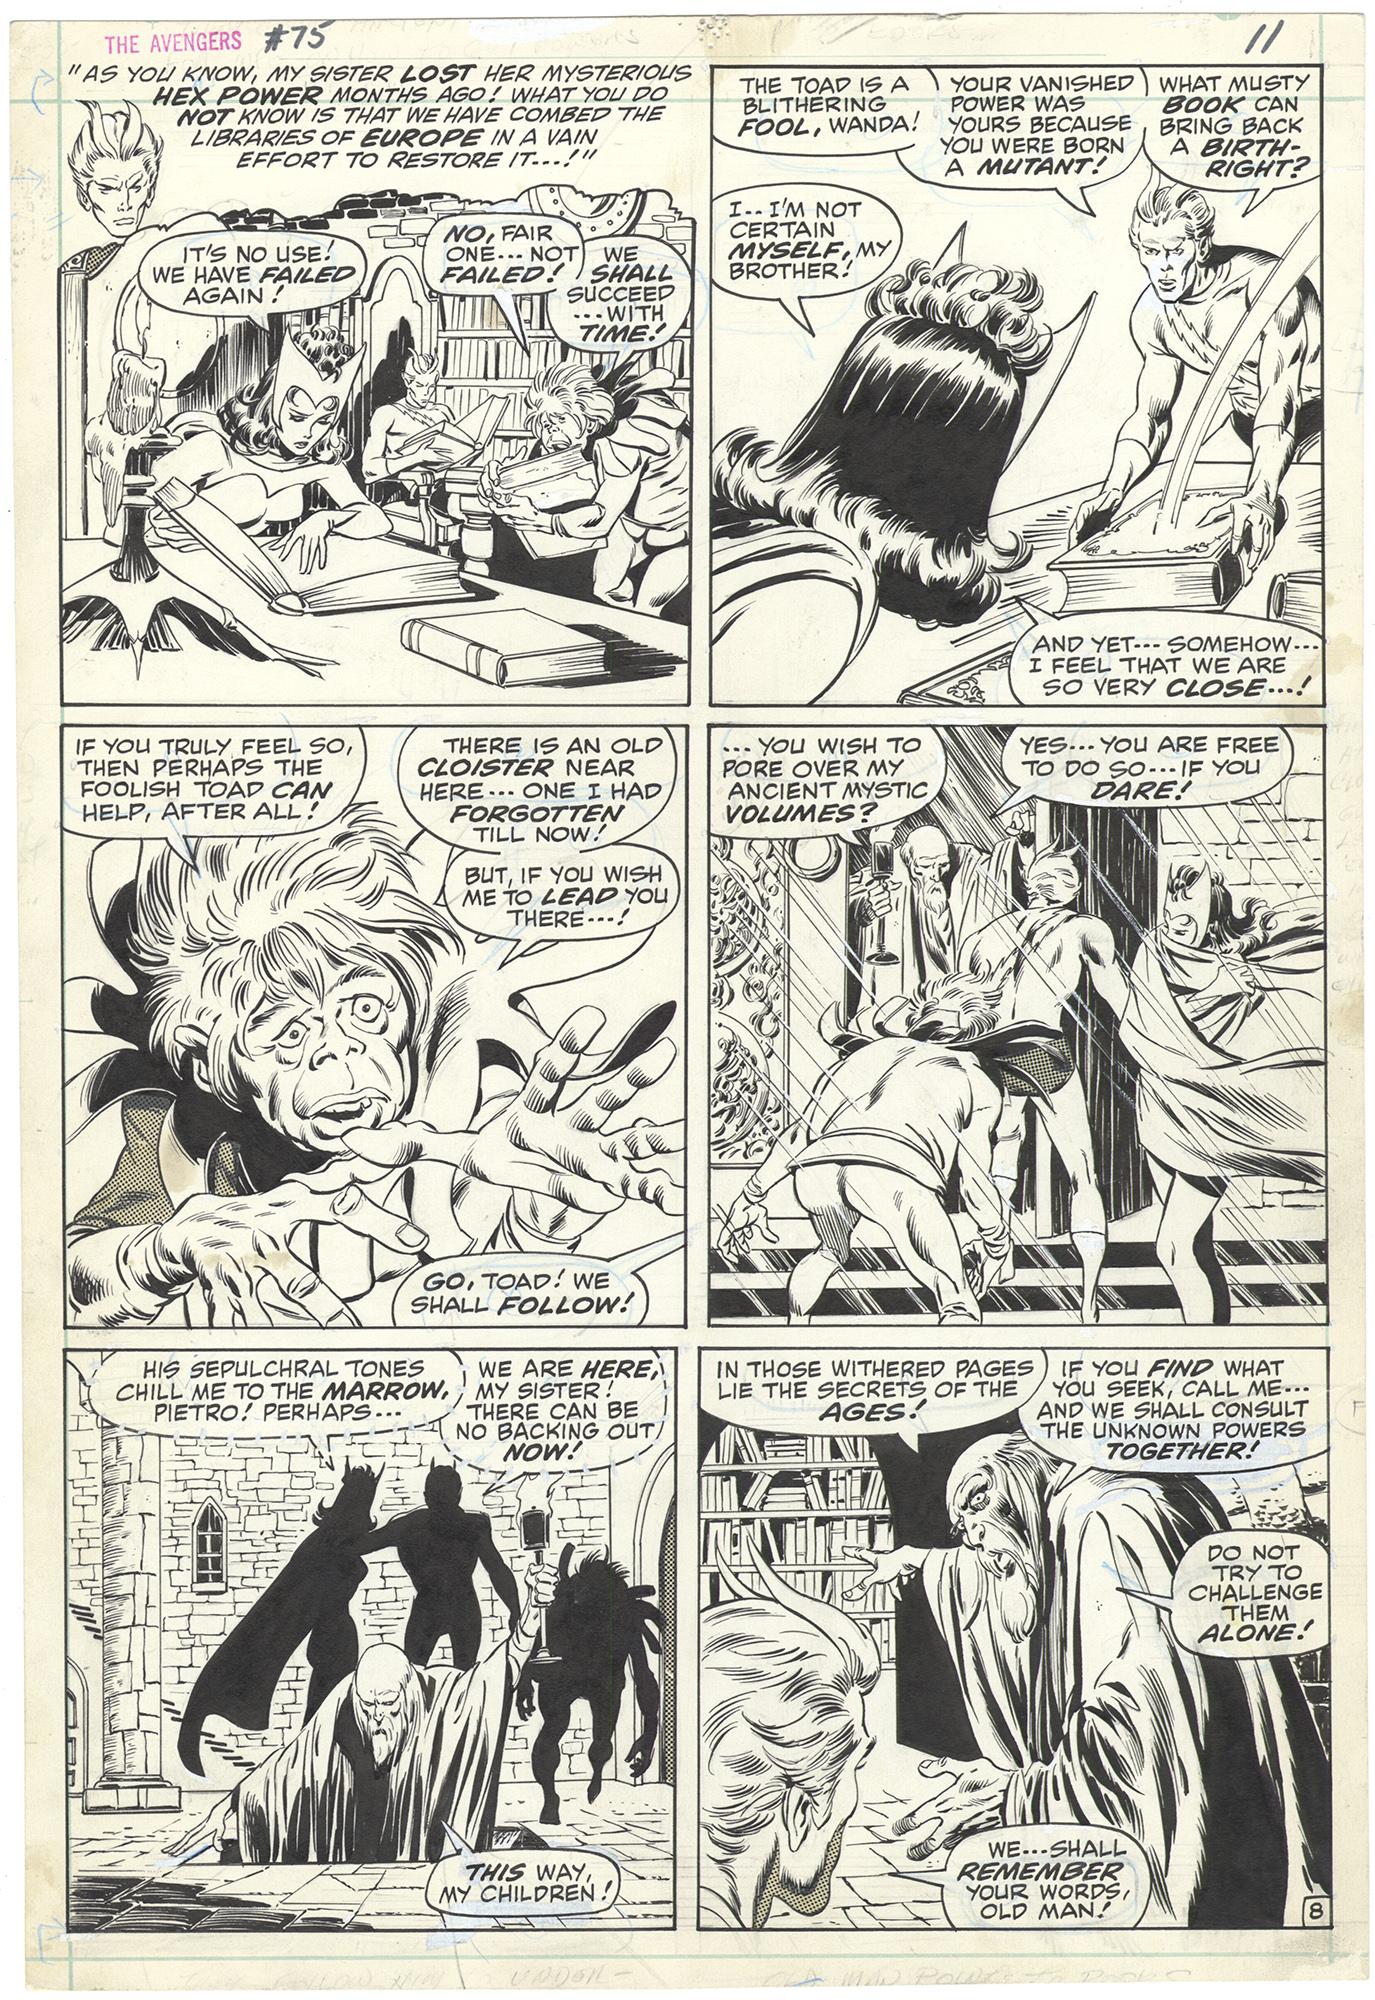 Avengers #75 p8